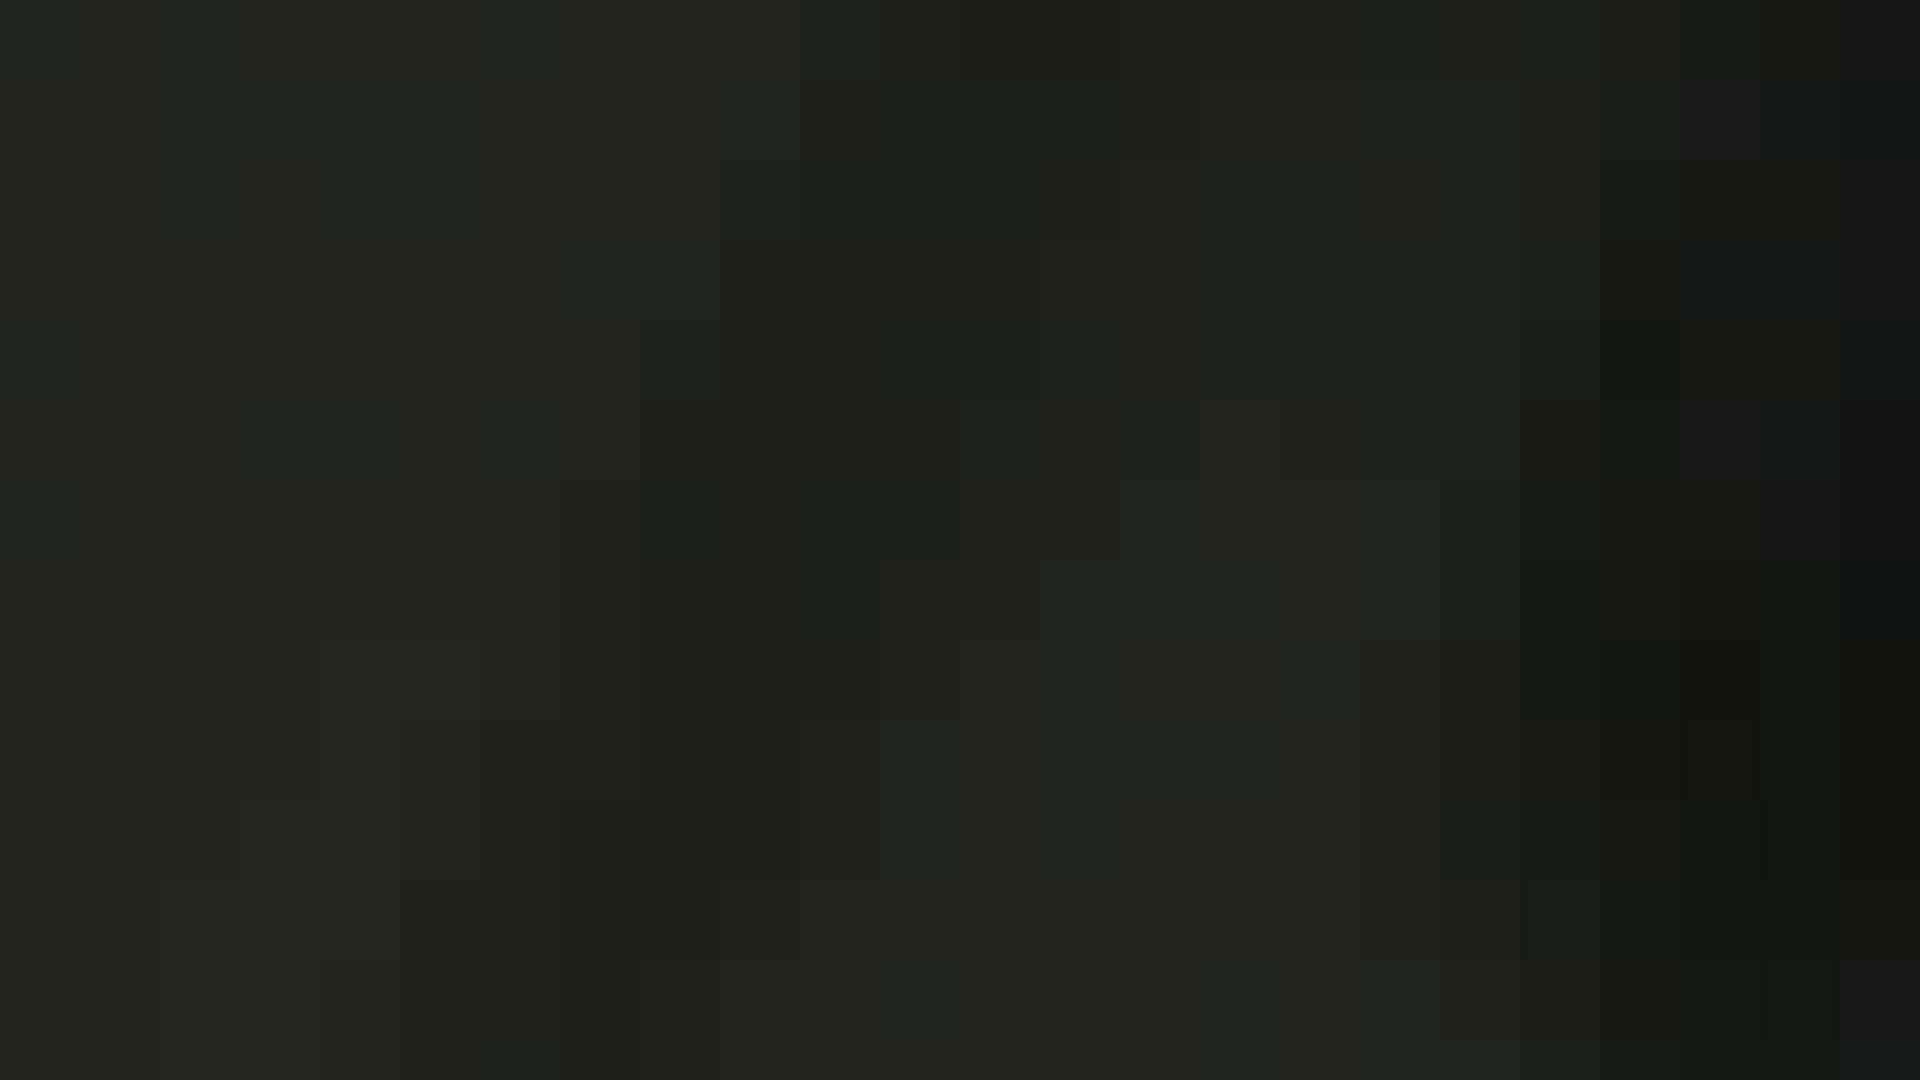 vol.02 着替えシーンもありマス 丸見え ワレメ無修正動画無料 109画像 83